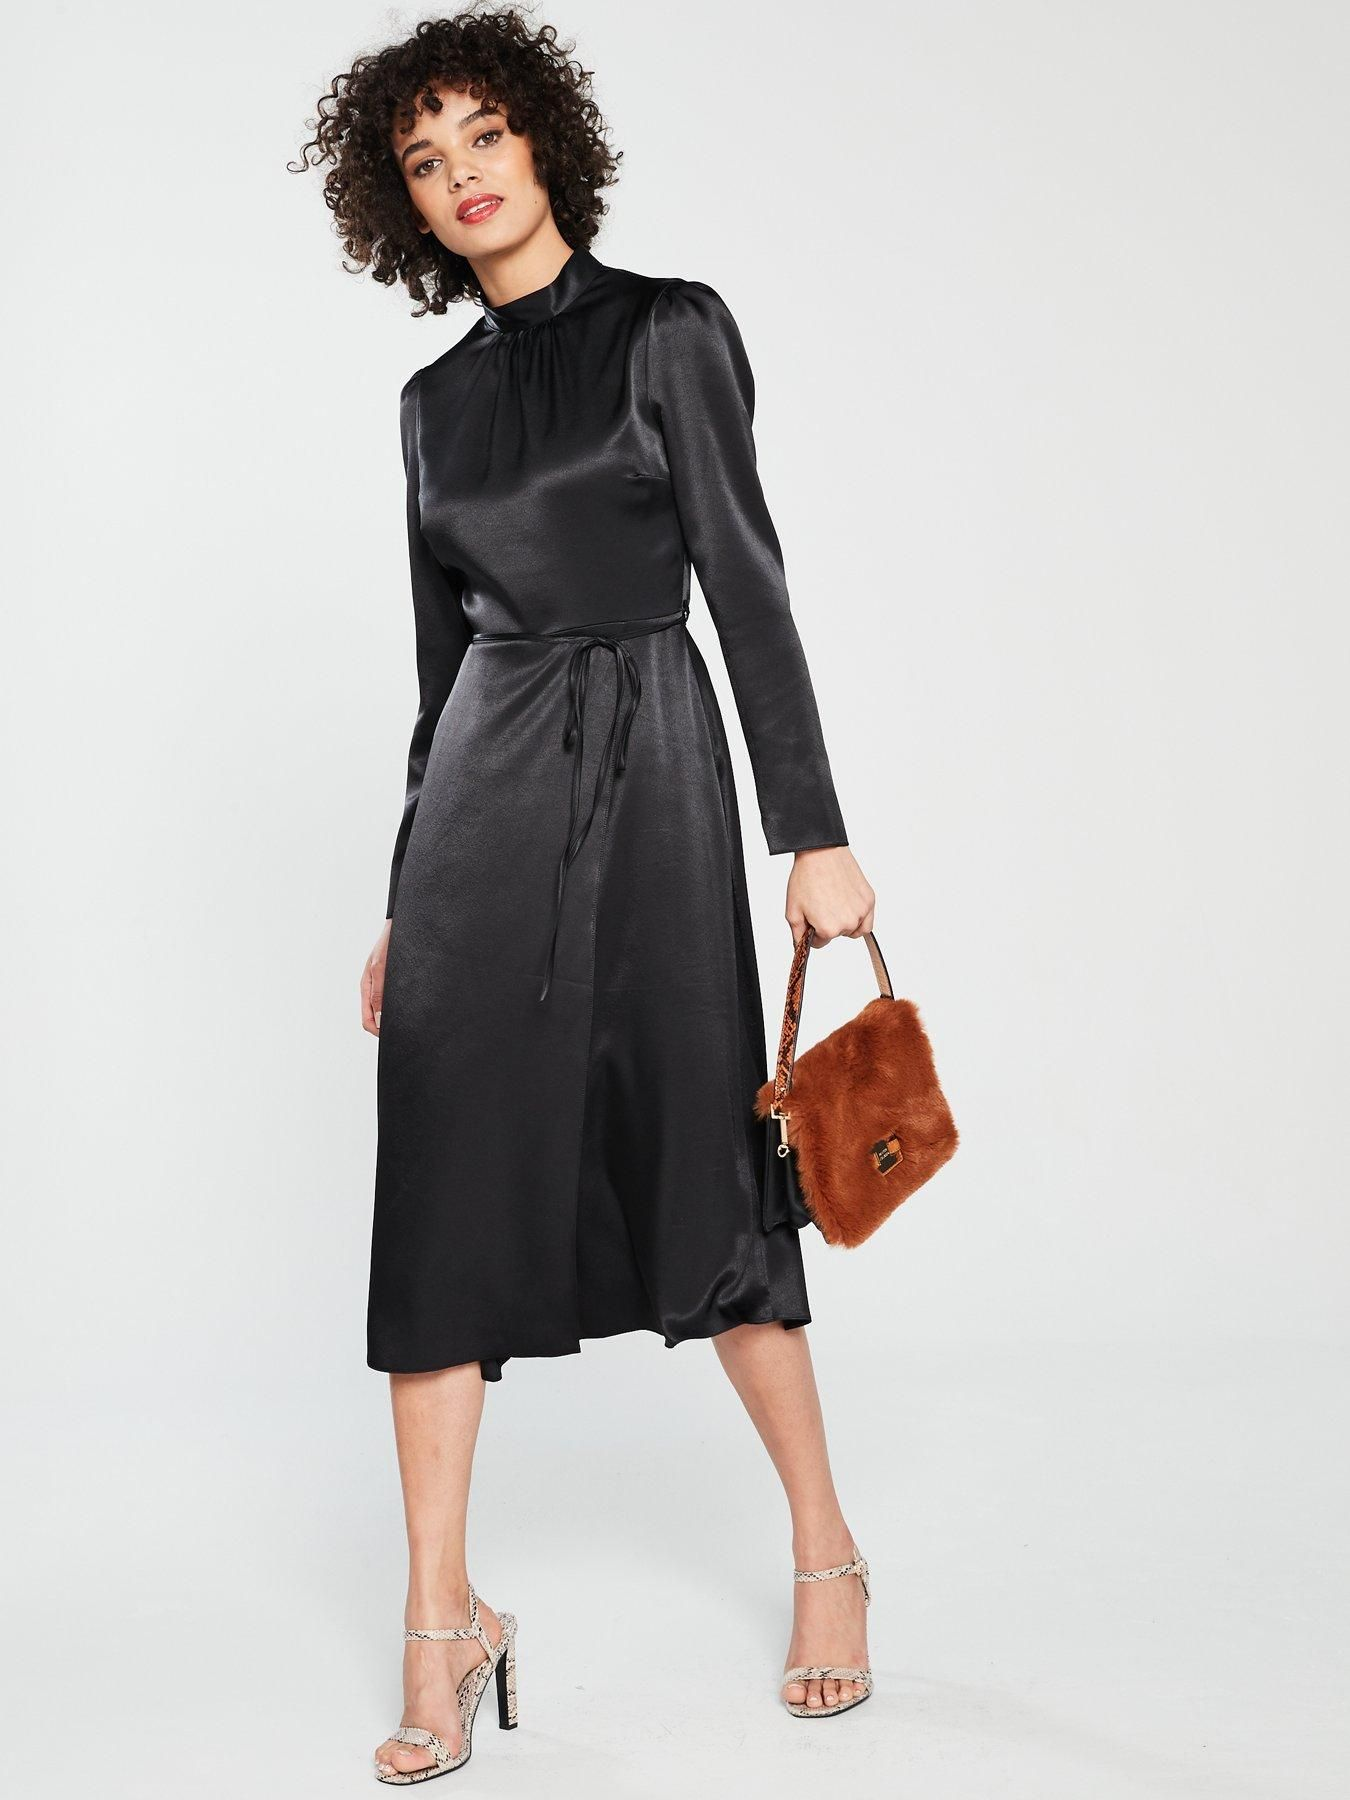 8201072f981 Waisted Midi Dress - Black in 2019 | Outfits | Black midi dress ...